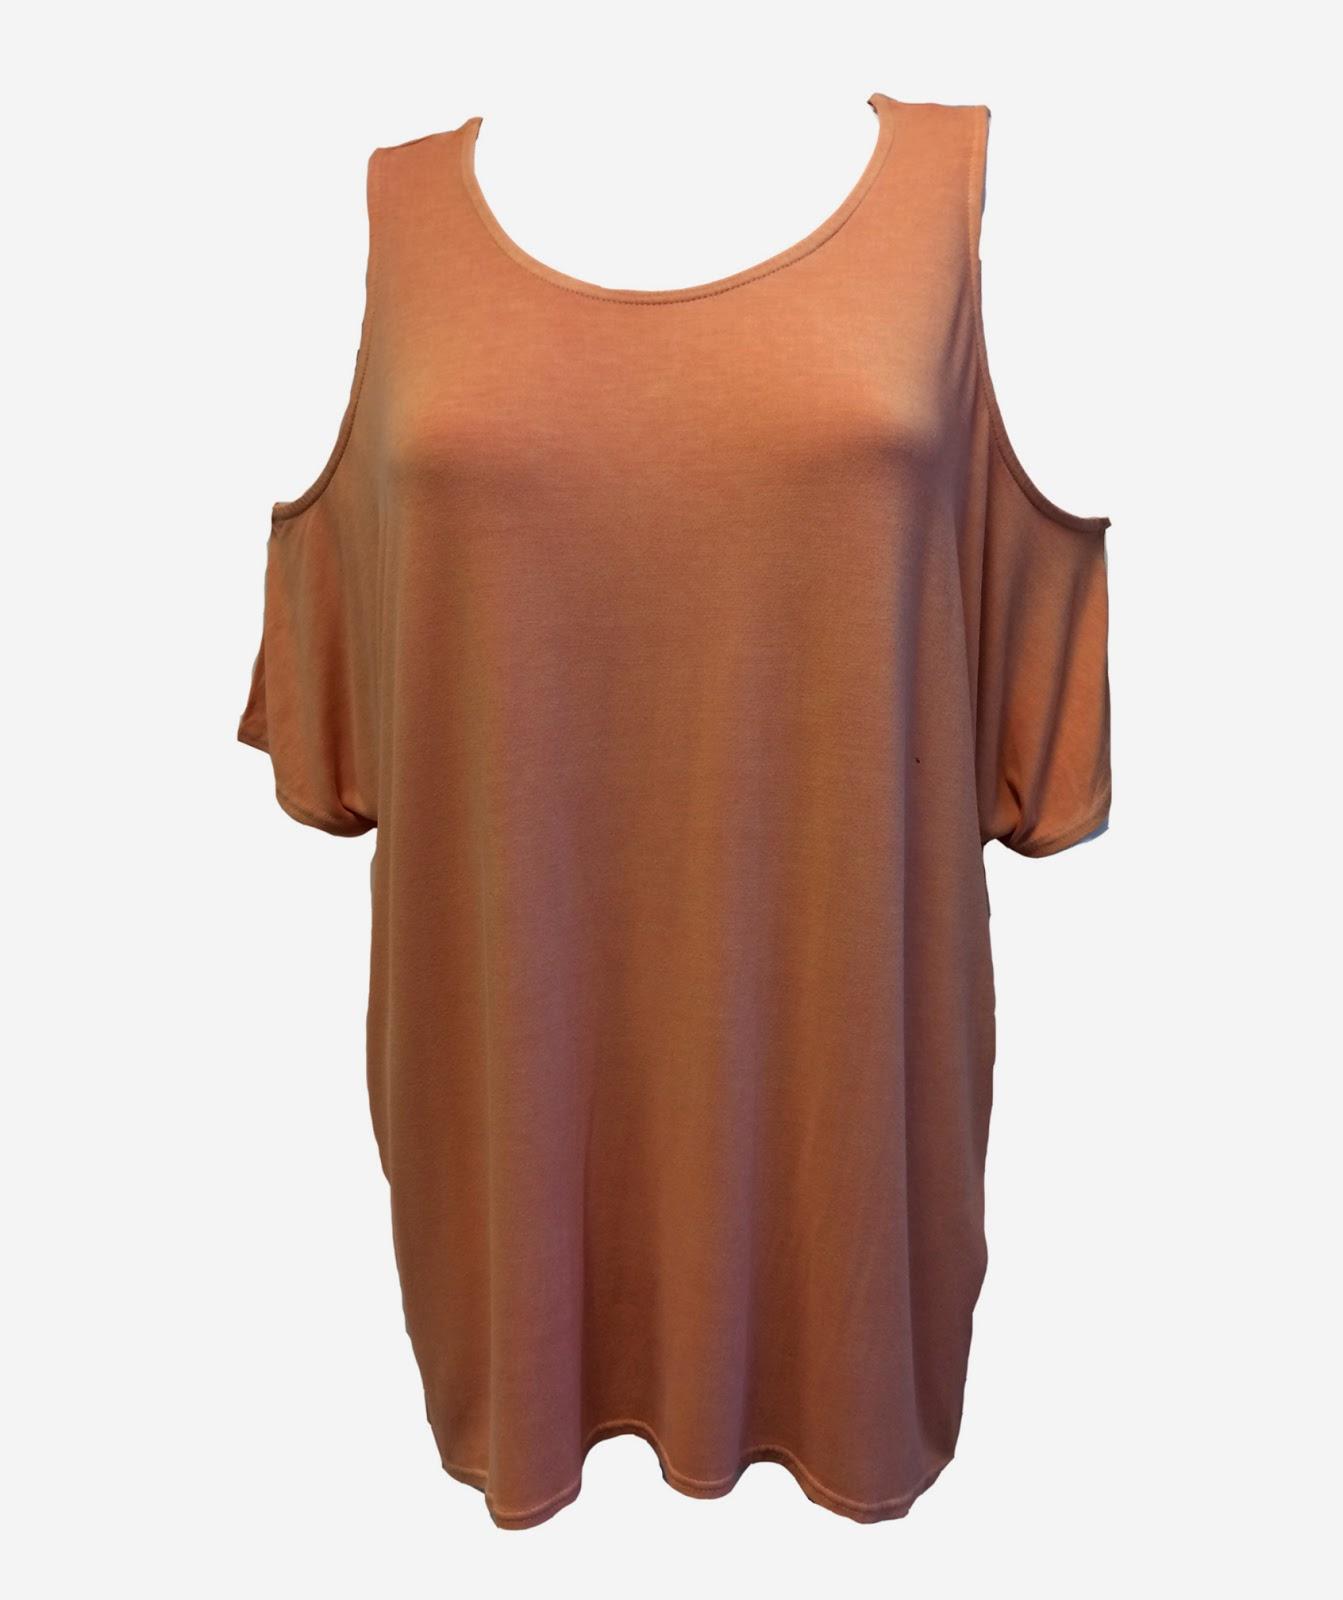 Djc clothing online